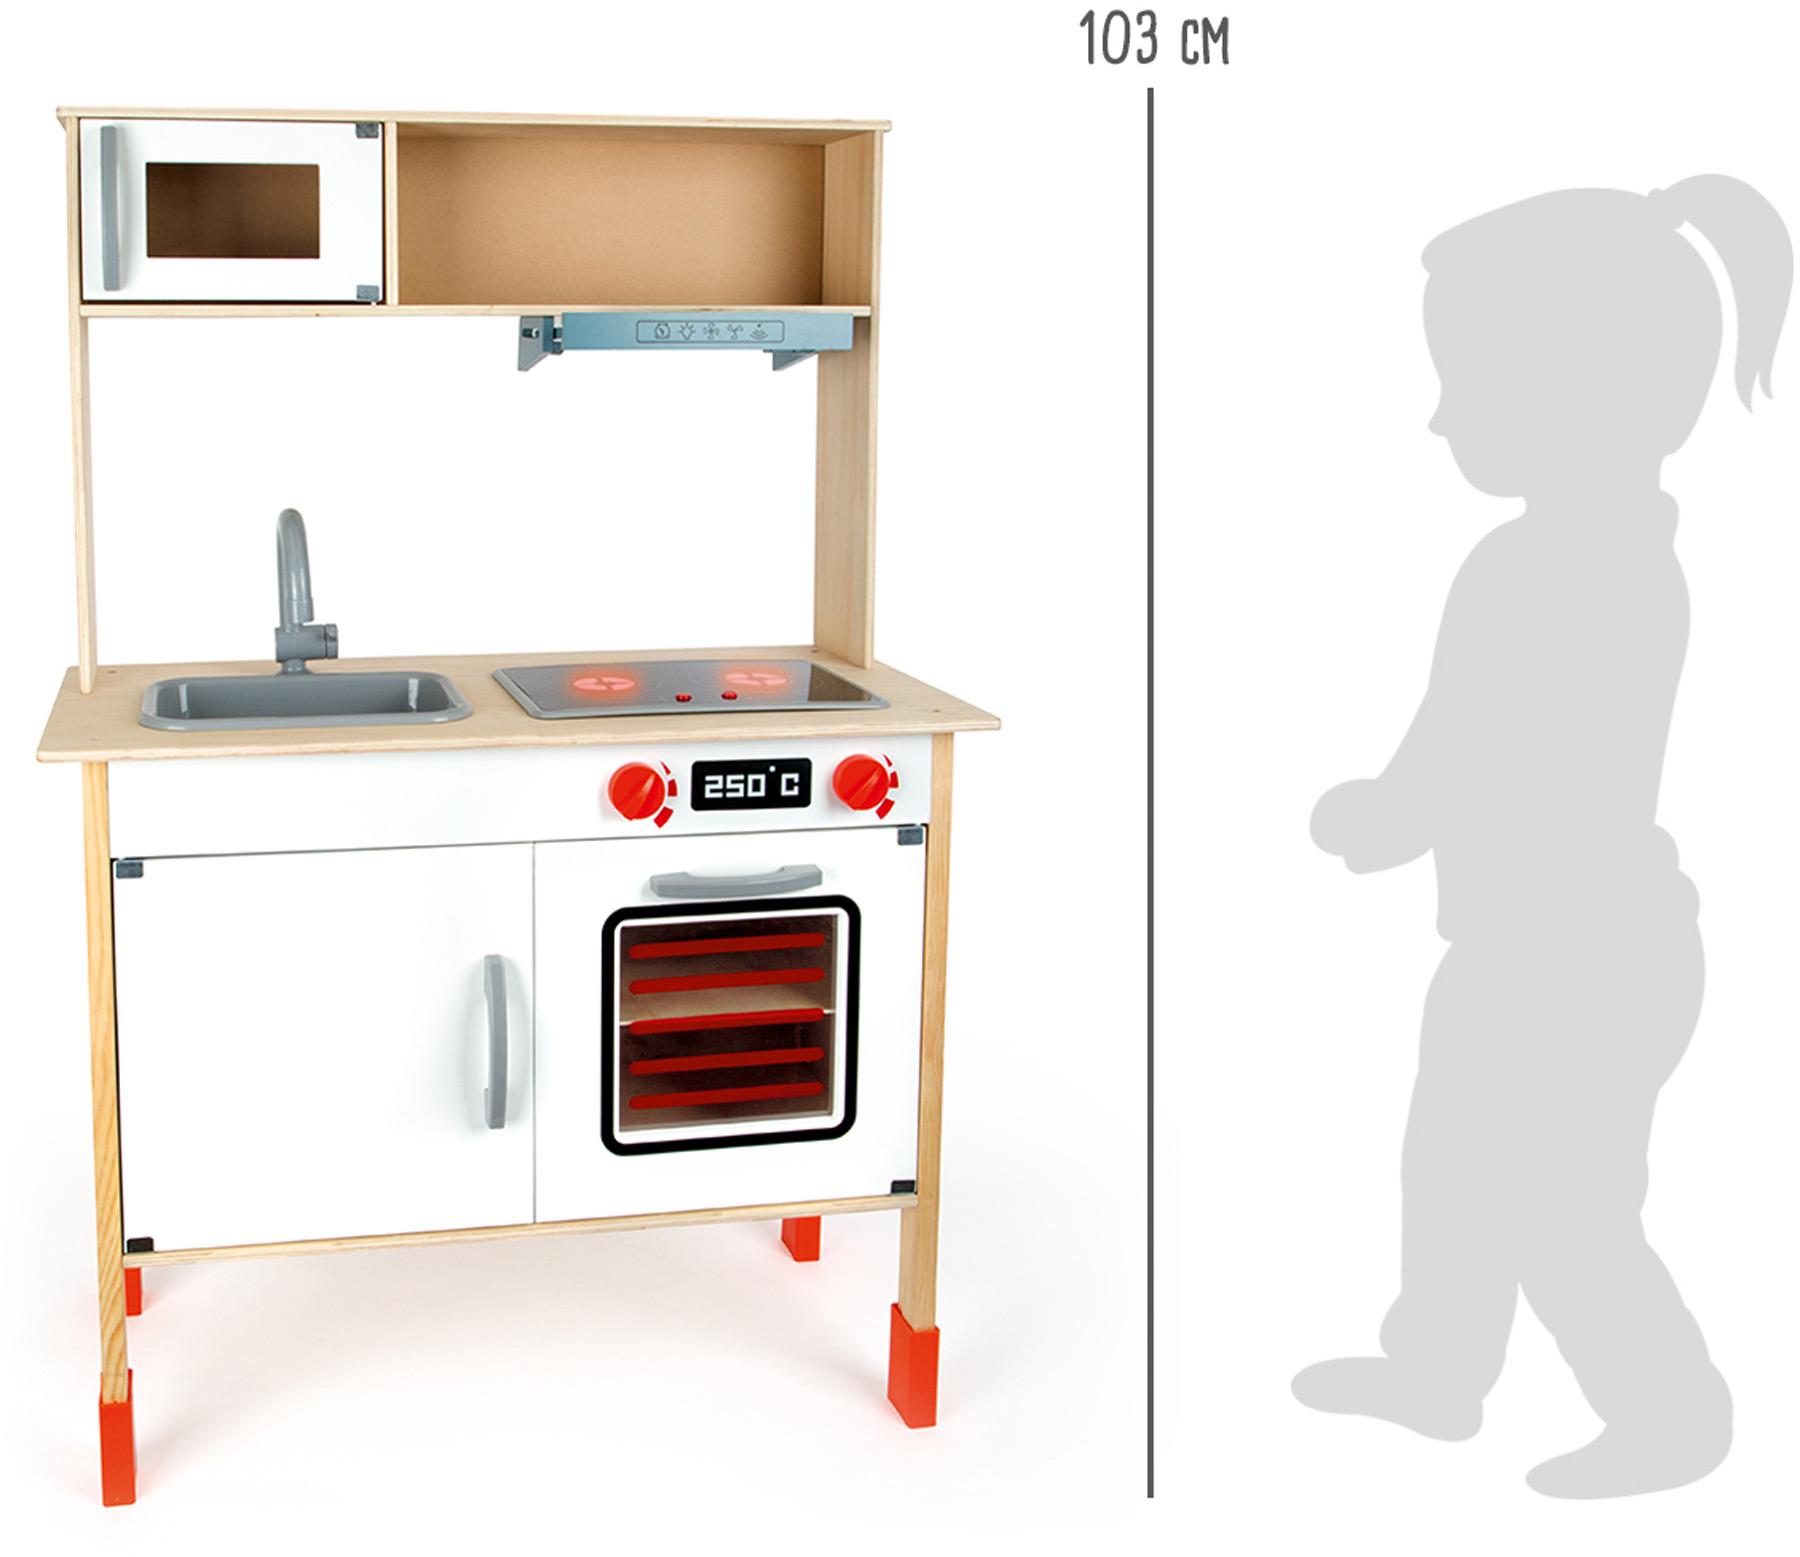 Cucina per bambini moderna - Cucine per bambine ...